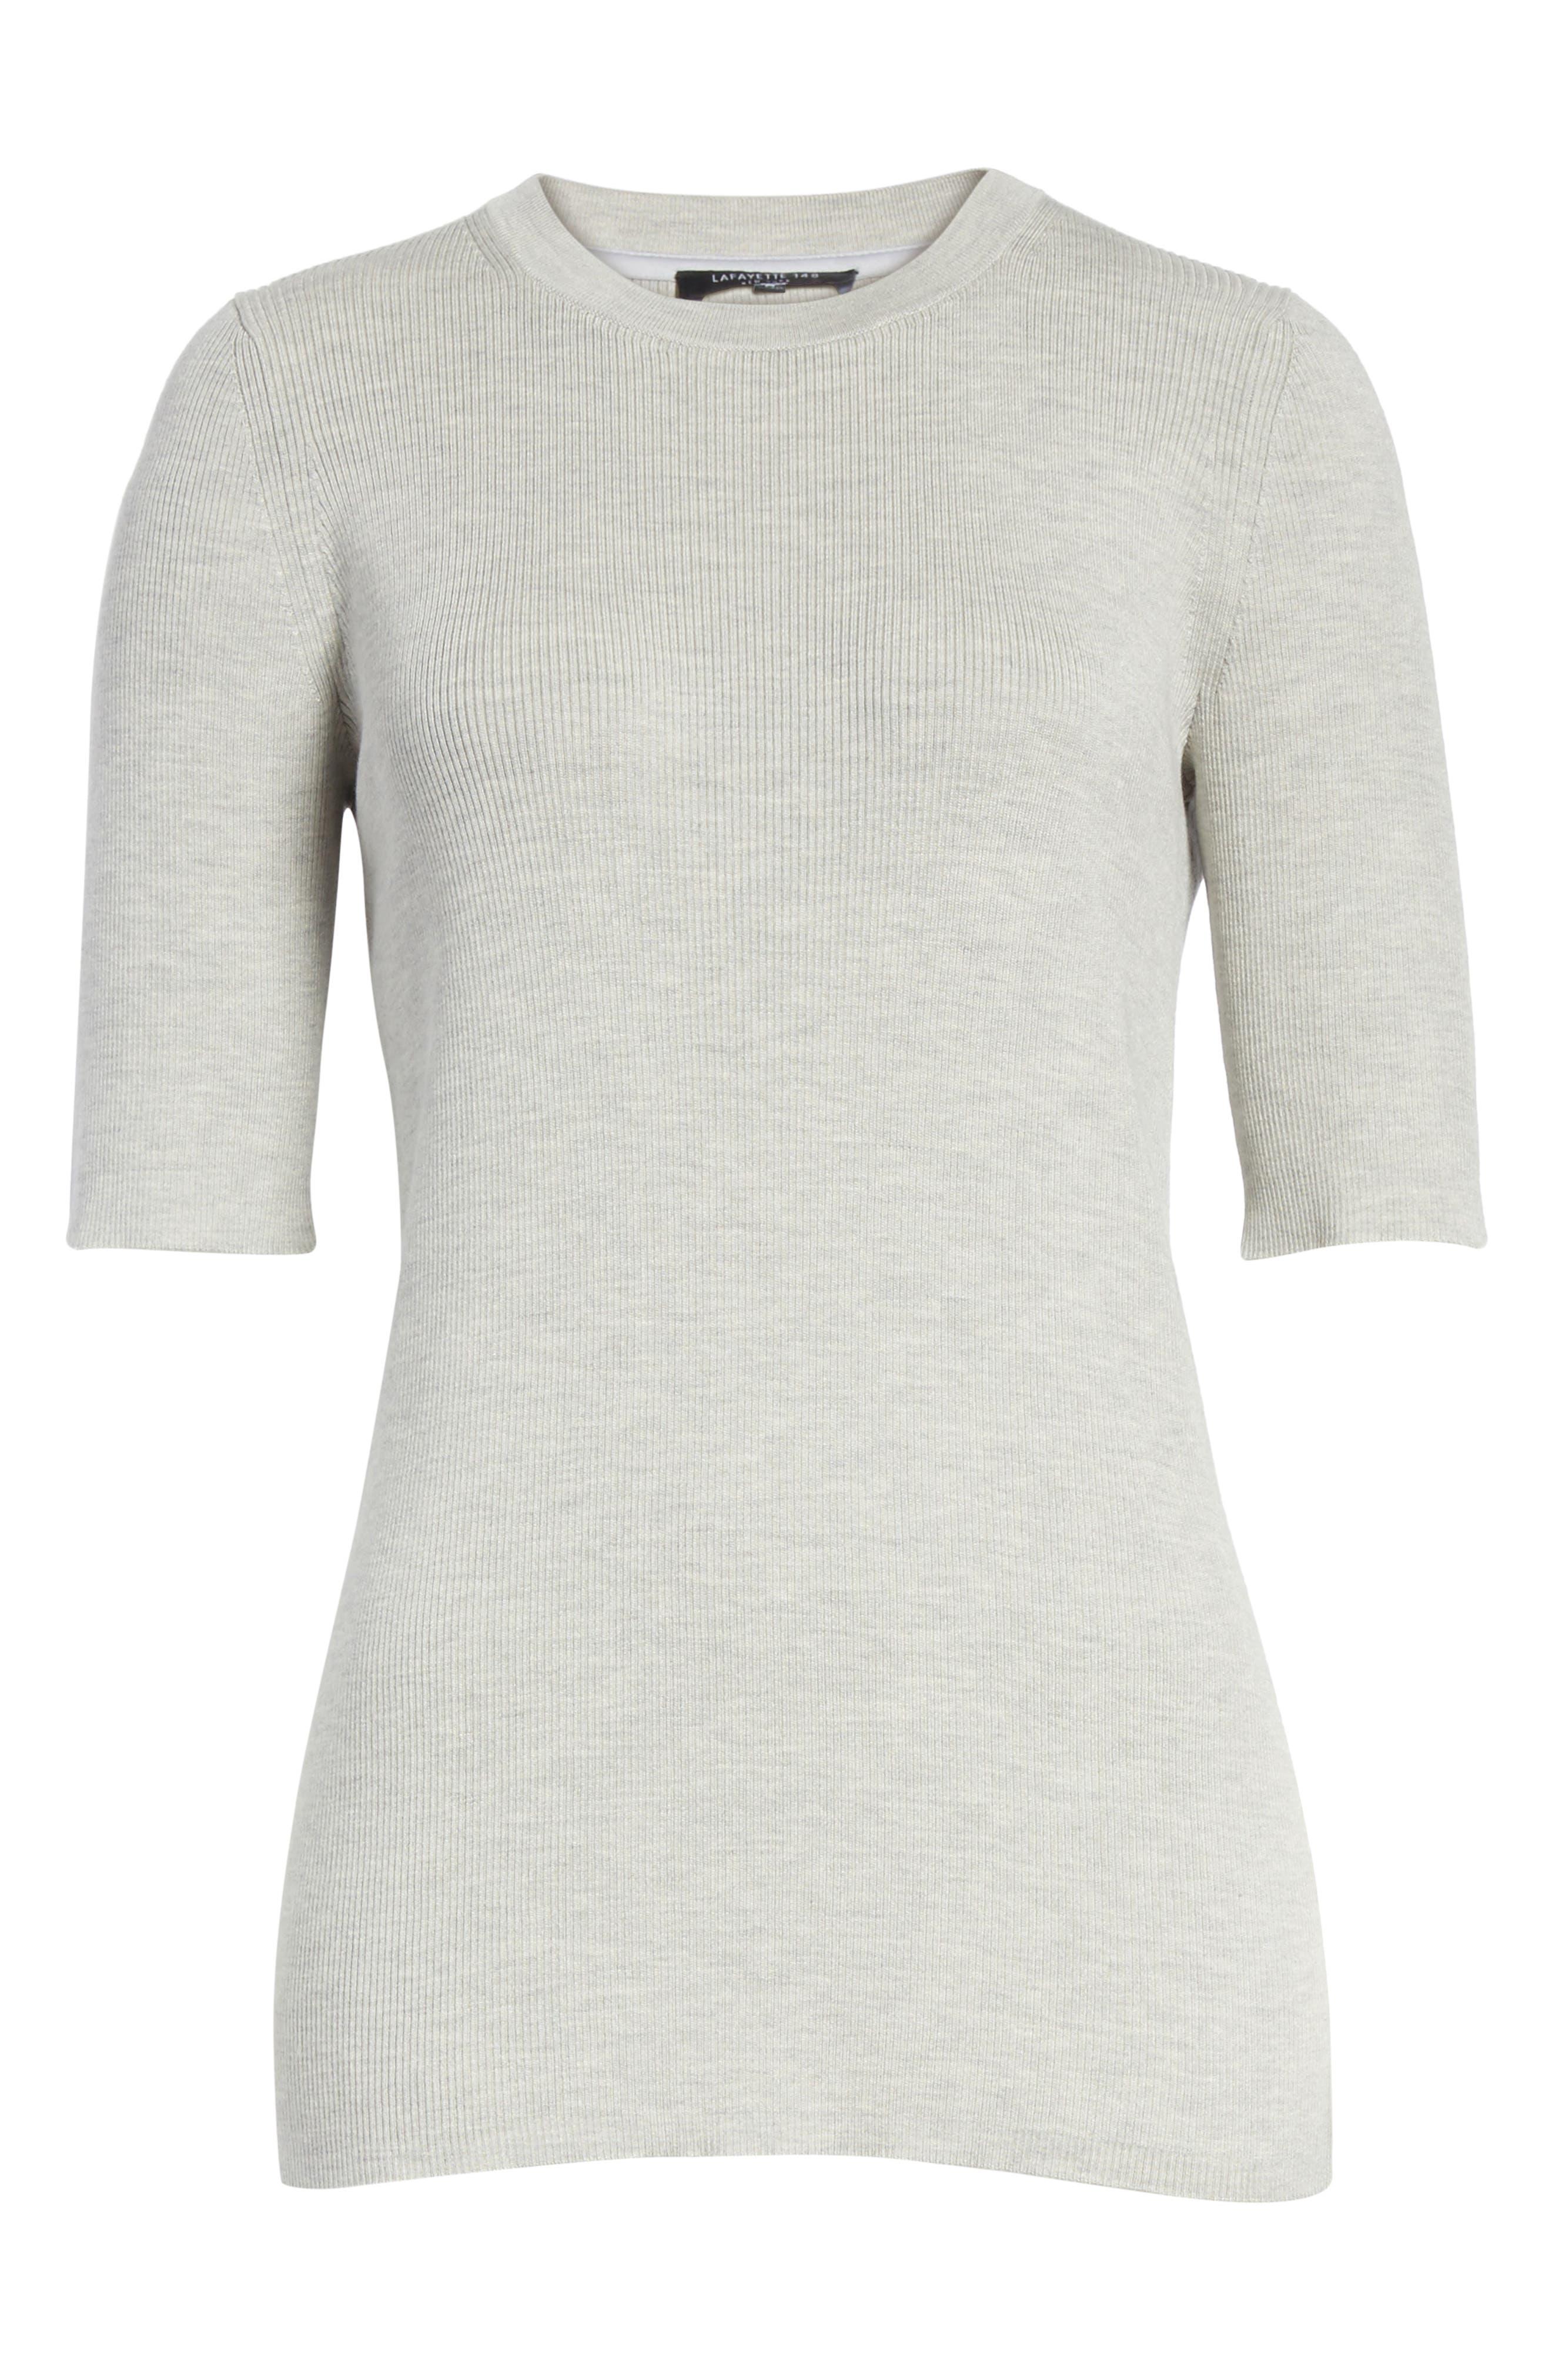 Rib Knit Silk Blend Sweater,                             Alternate thumbnail 6, color,                             Pebble Melange